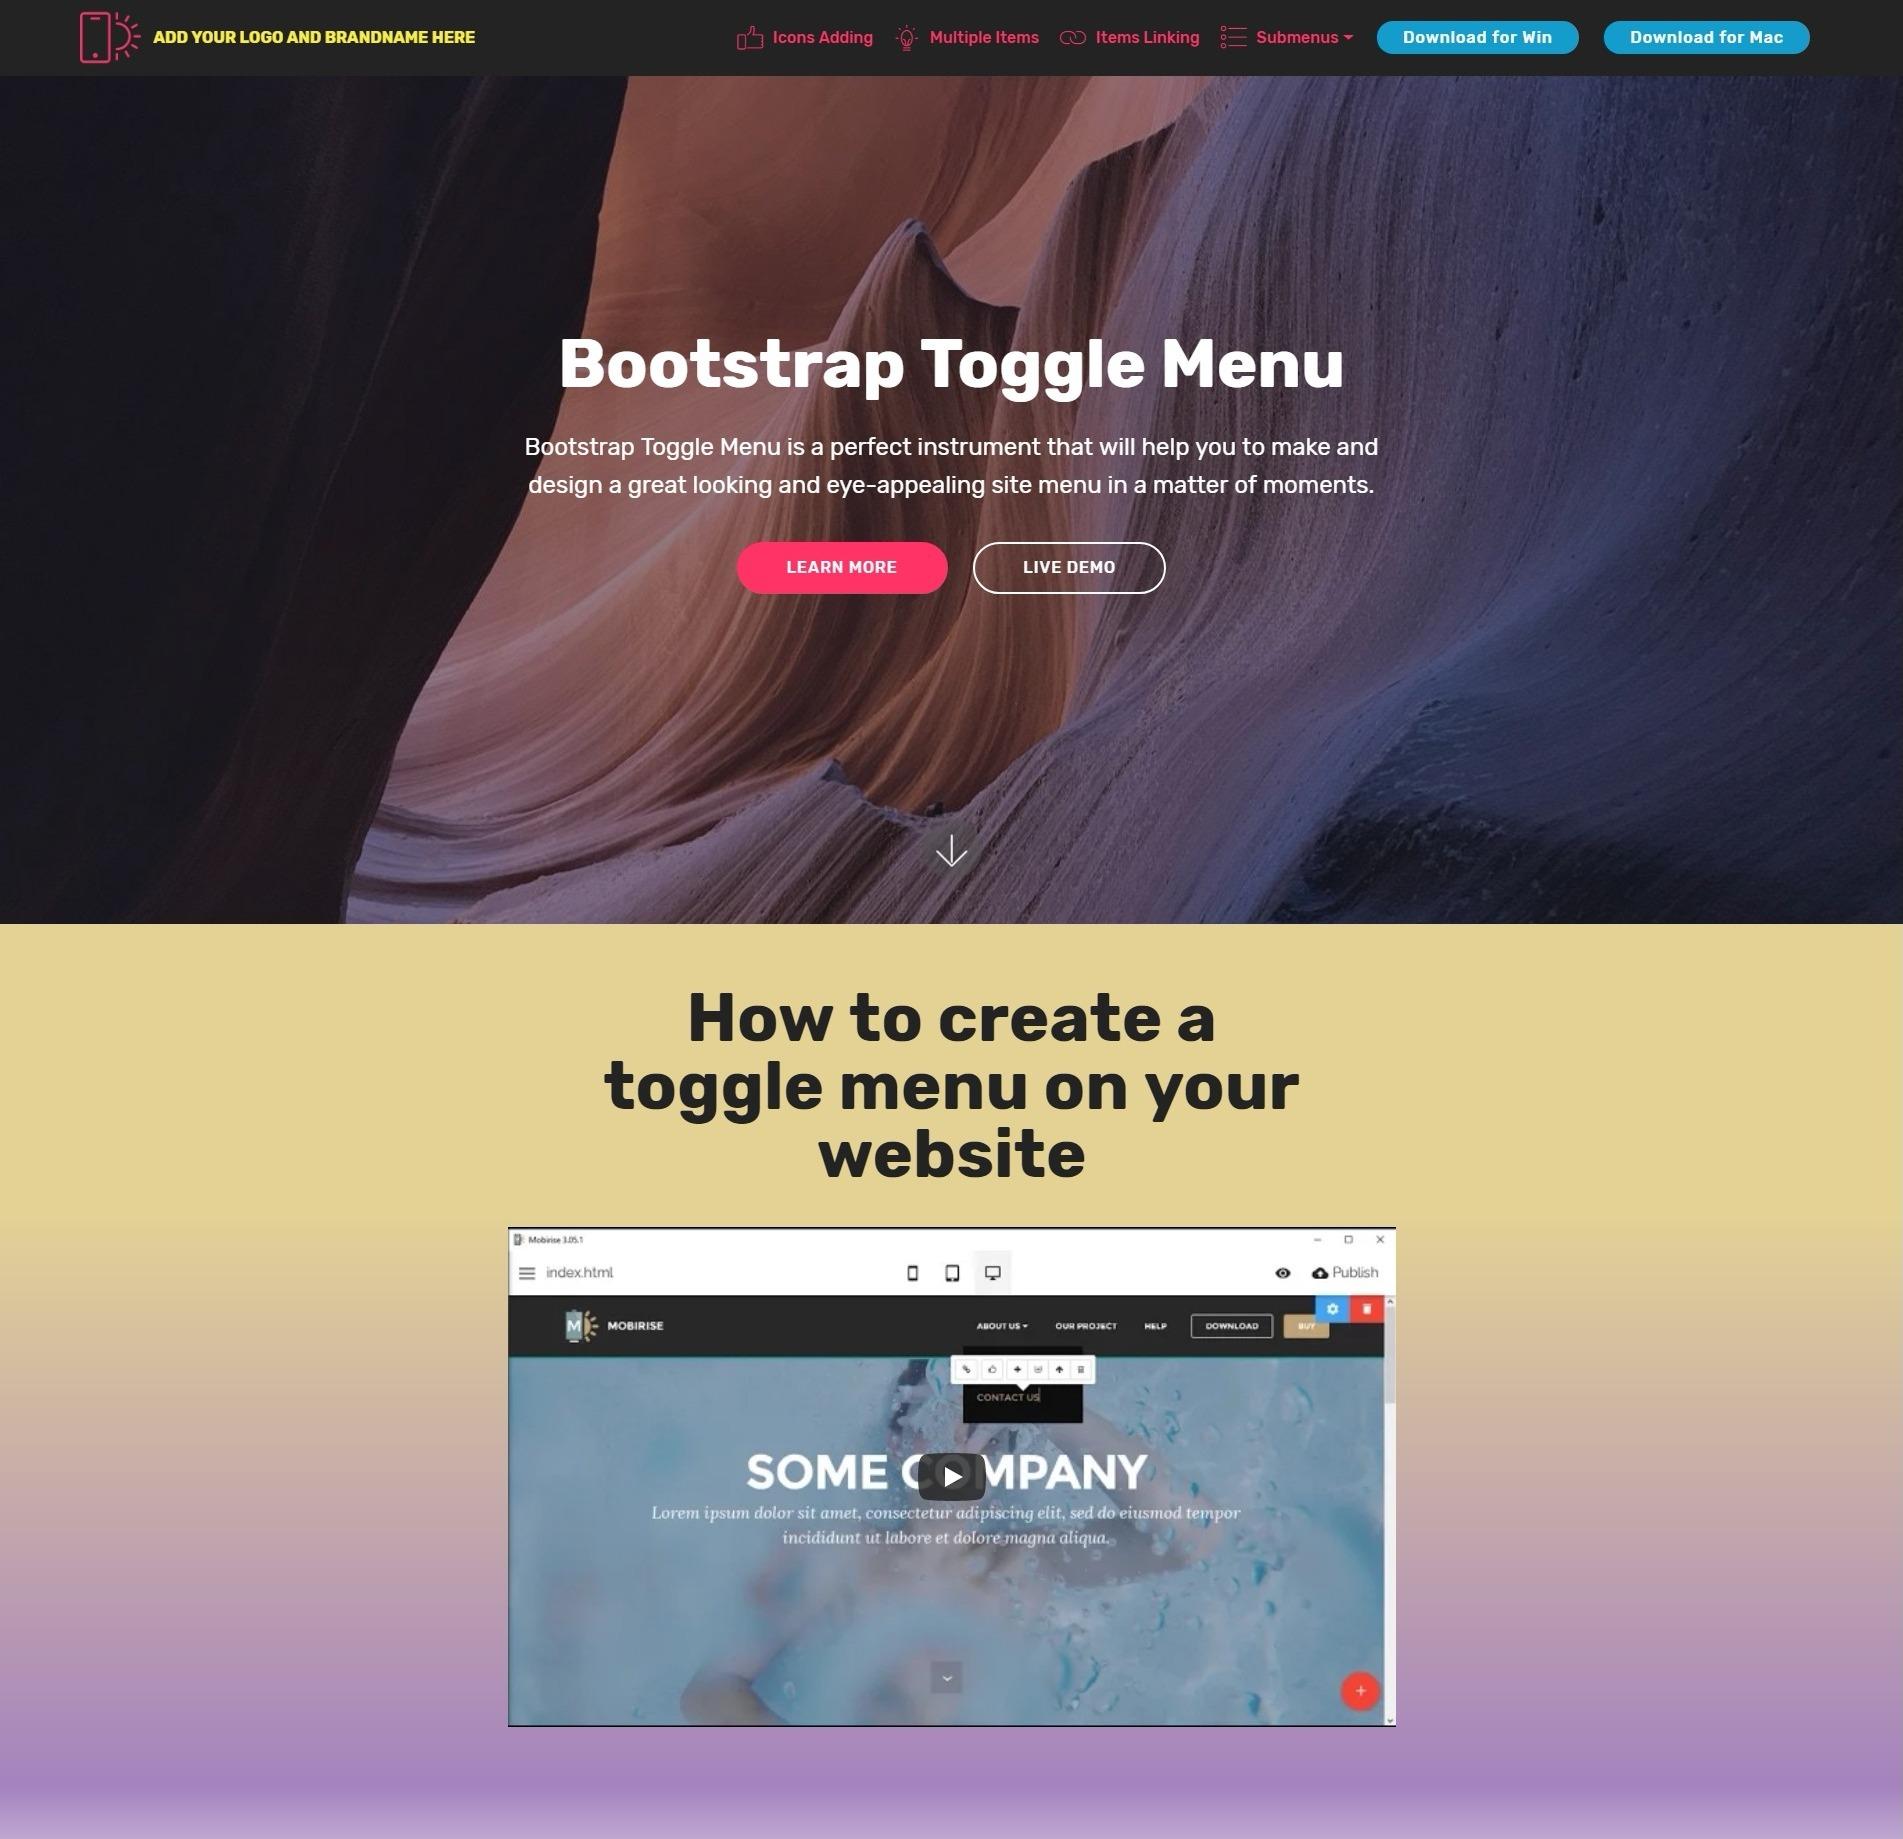 Bootstrap Toggle Menu